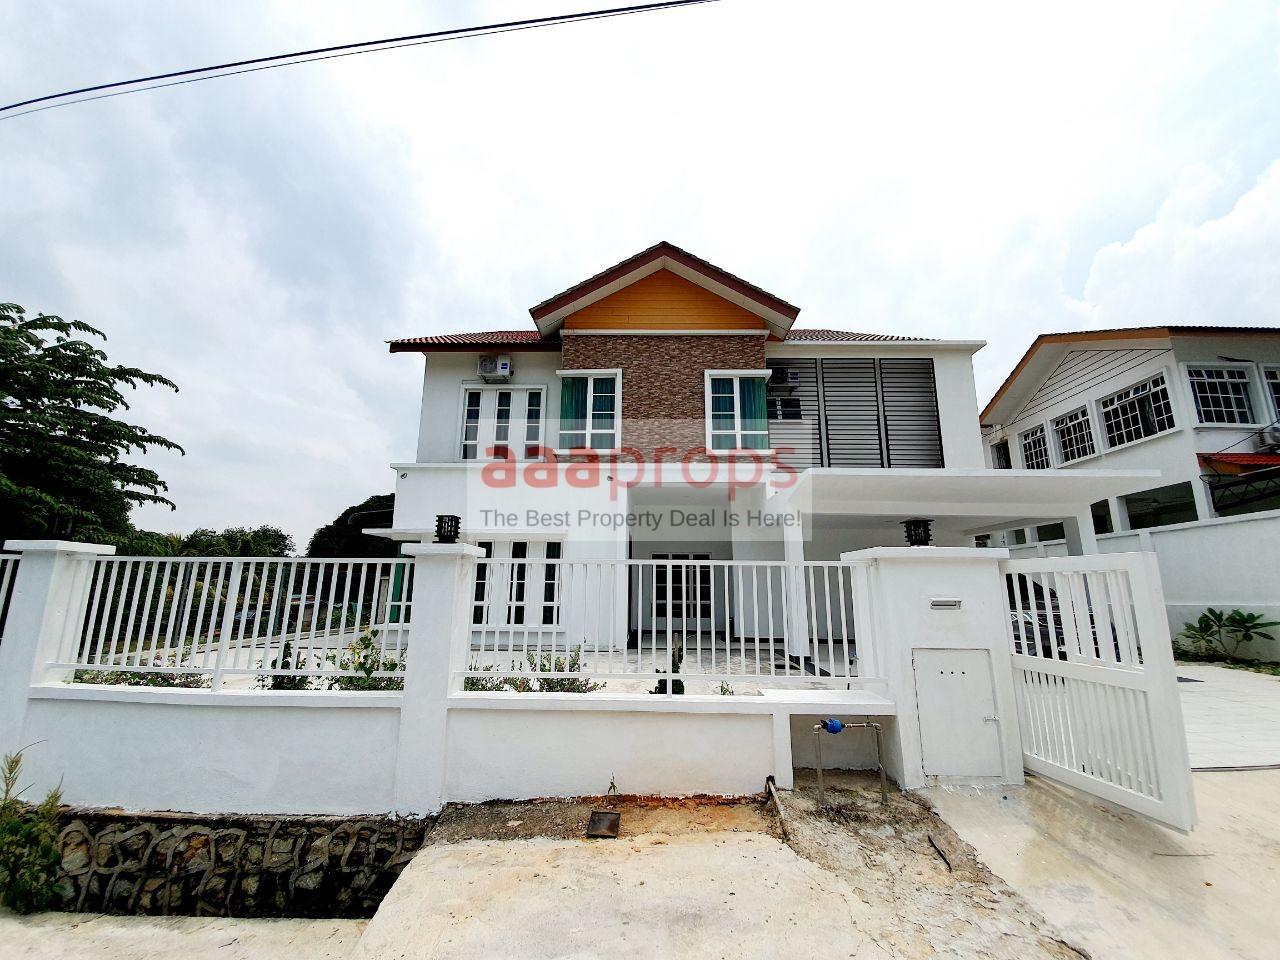 NEW HOUSE 2 STOREY BUNGALOW KAMPUNG GINCHING, BANDAR BARU SALAK TINGGI SEPANG